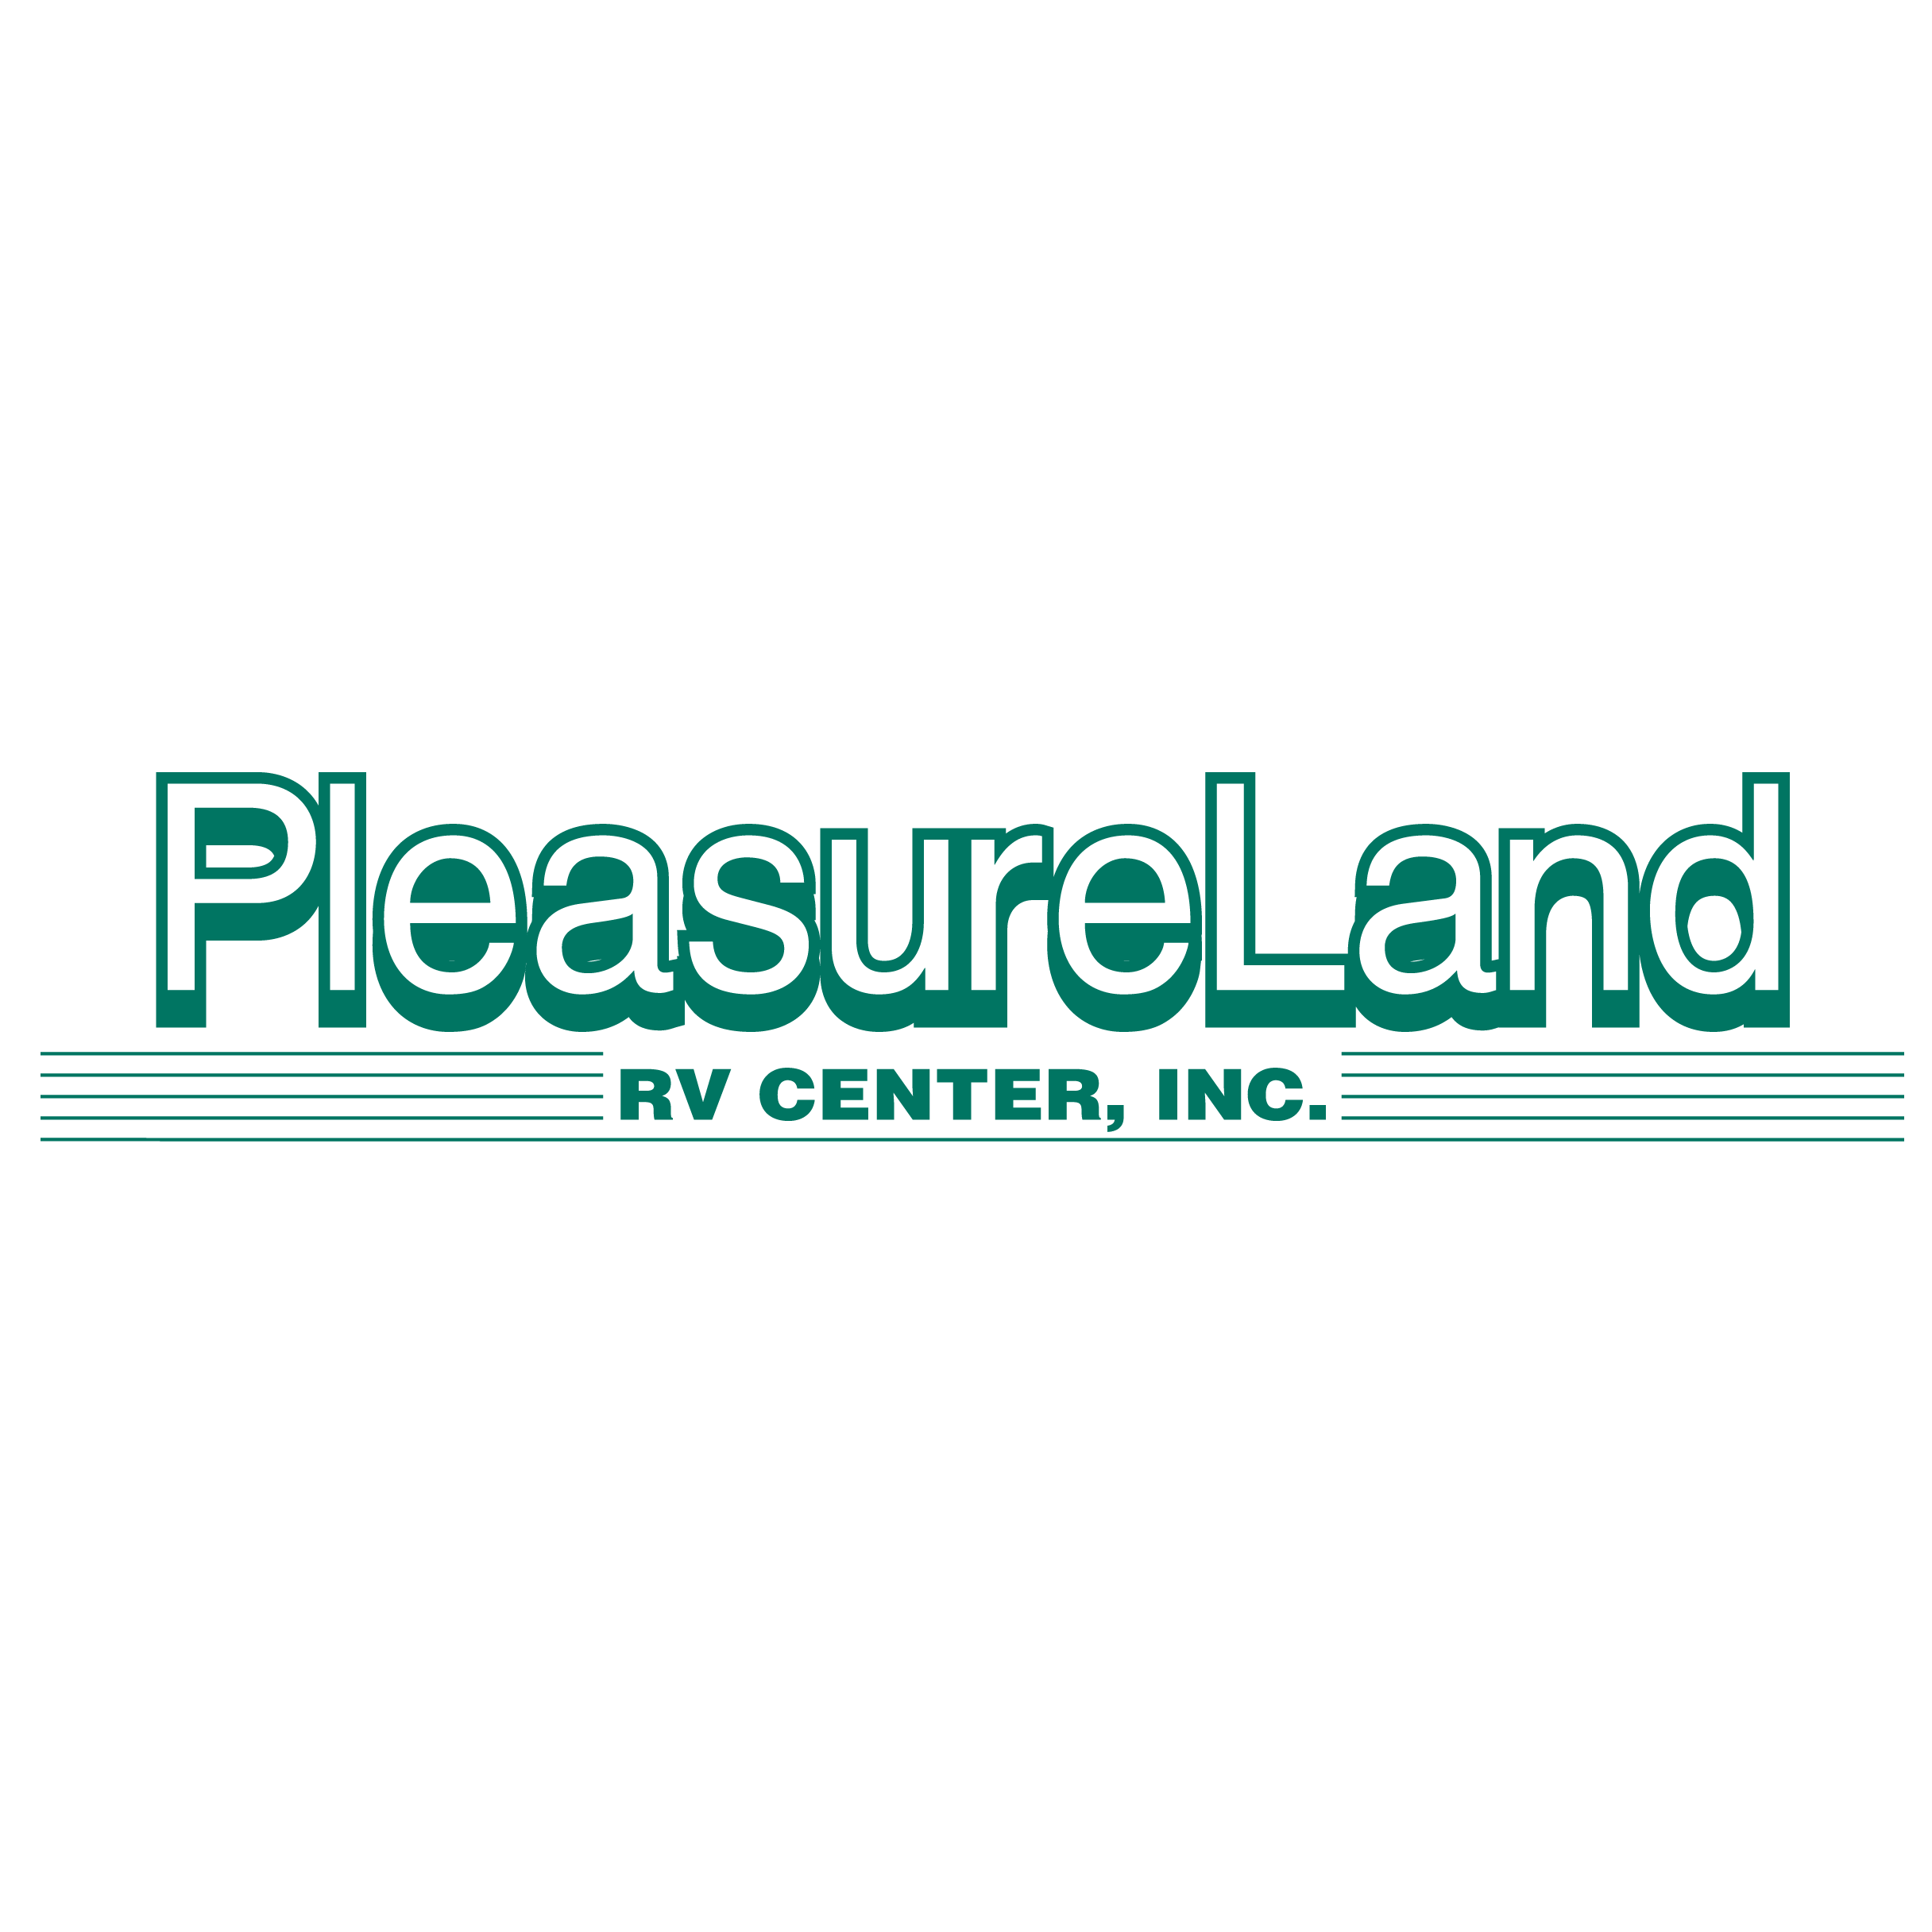 Pleasureland RV Center - Long Prairie